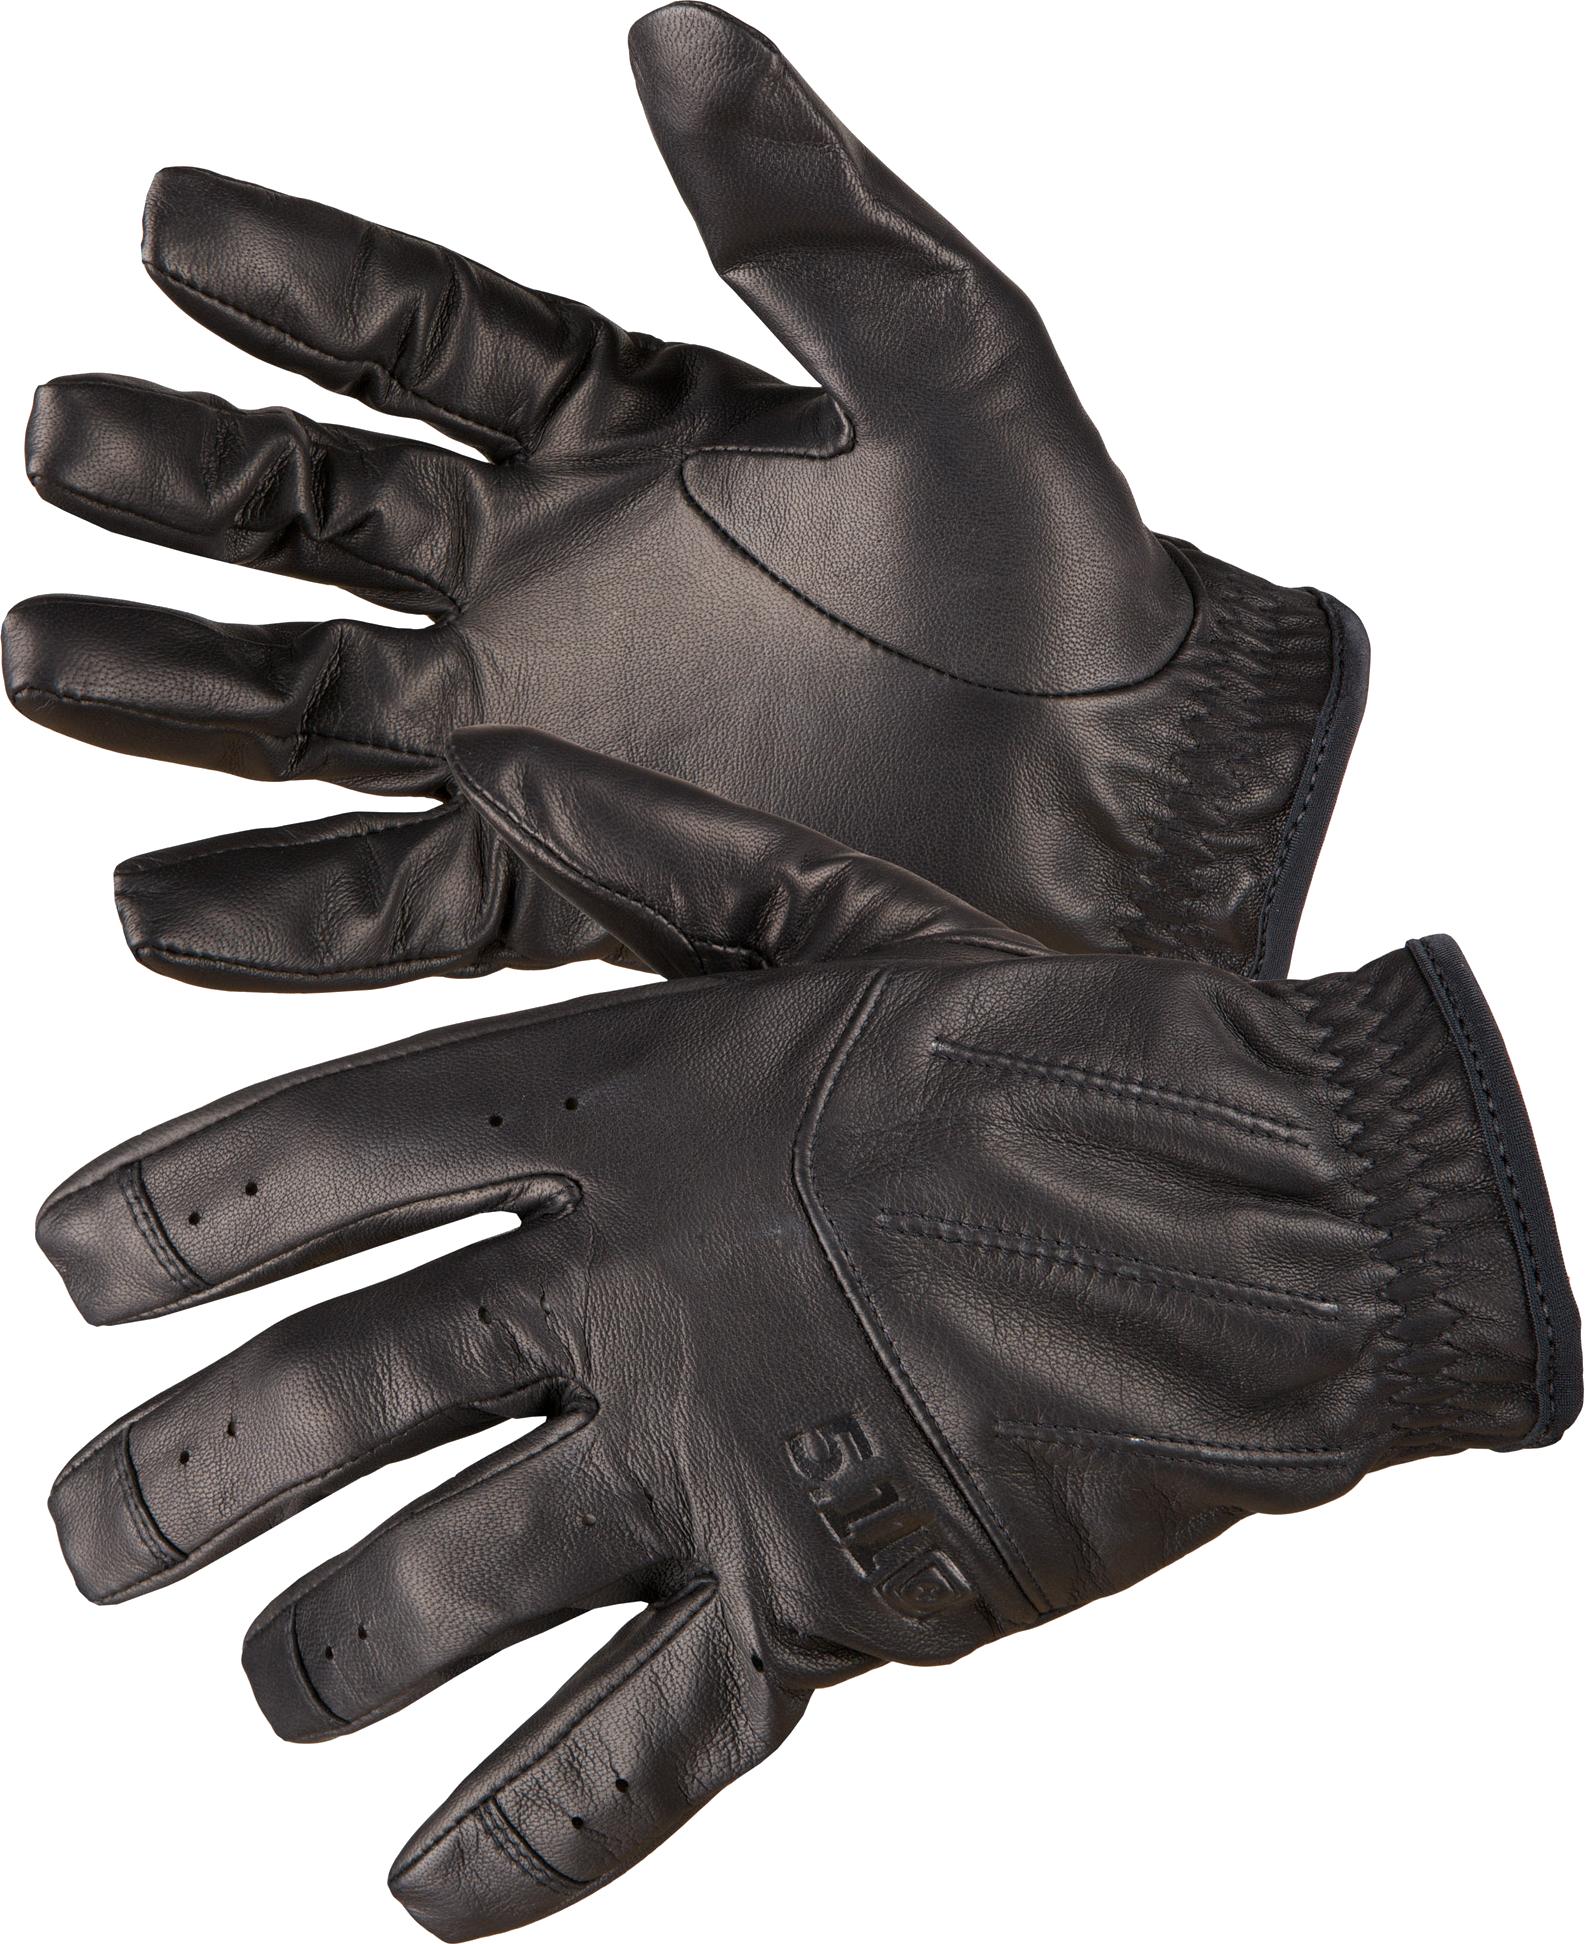 Glove clipart pink glove. Png gloves transparent images